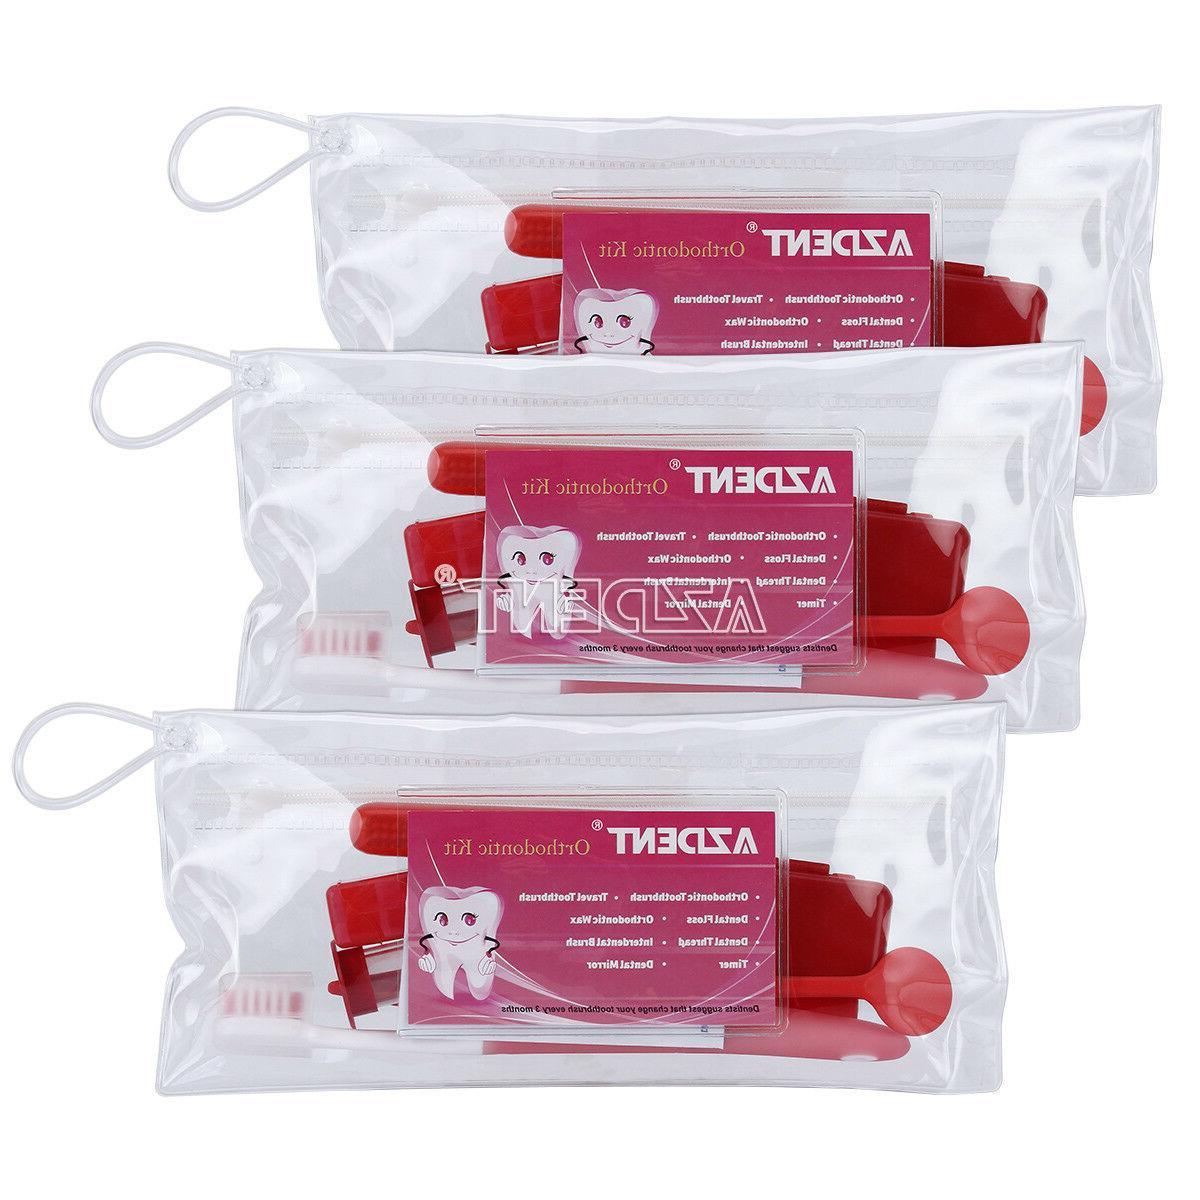 Ties Brush Floss Set Care